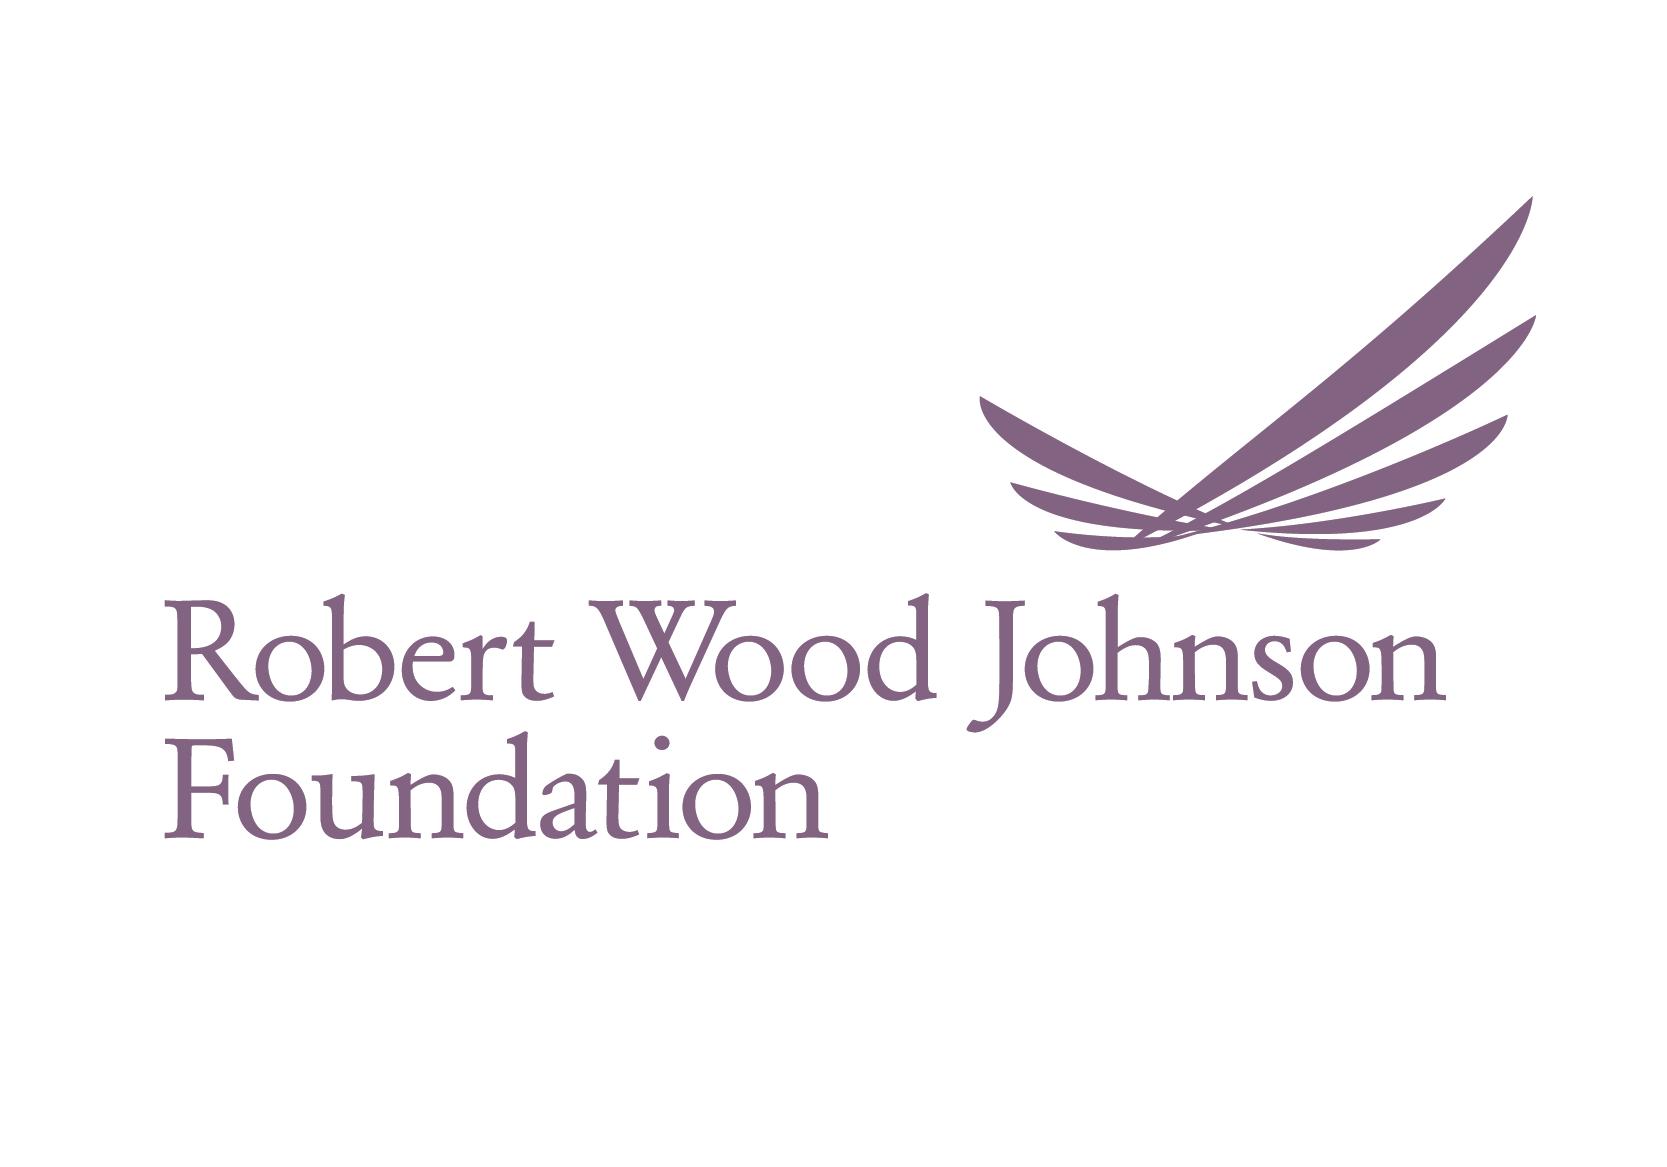 Robert-Wood-Johnson-Foundation-27.png